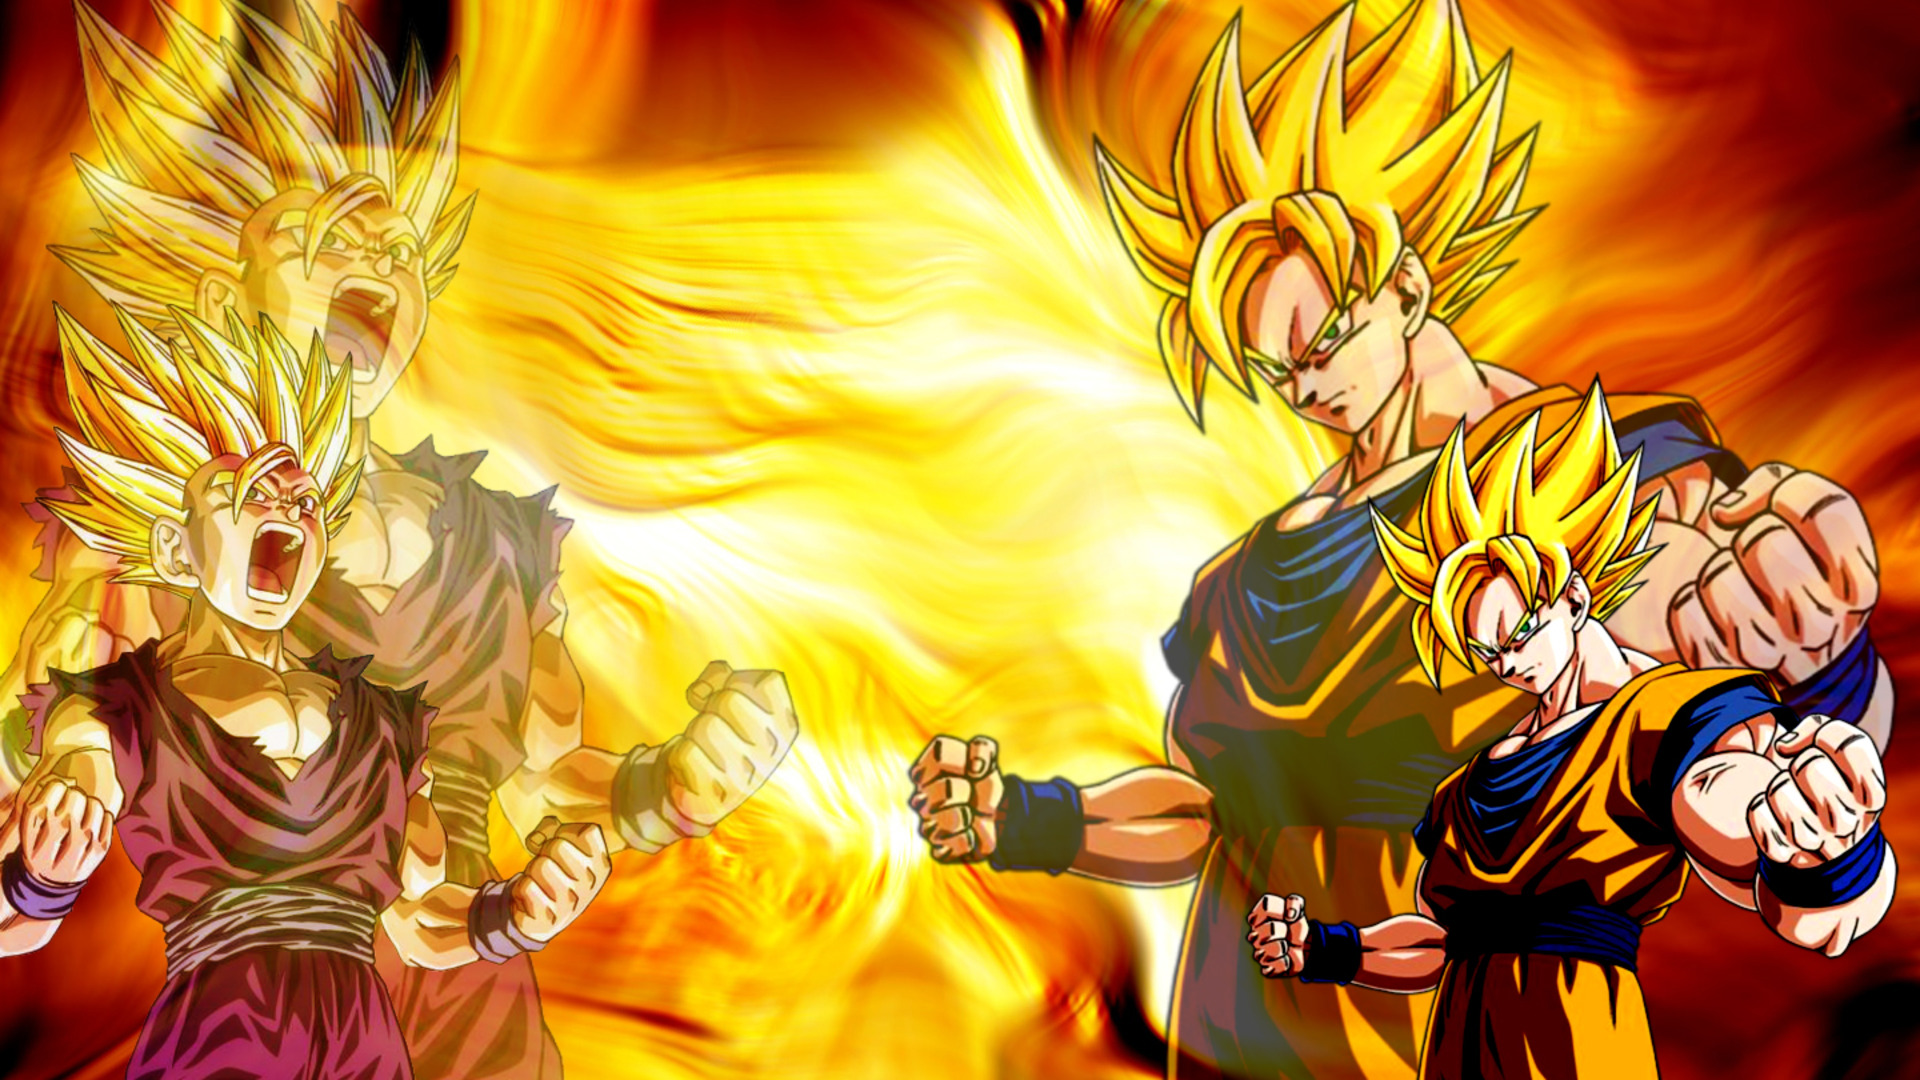 Download Son Goku Wallpaper 1920x1080 Wallpoper 417484 1920x1080